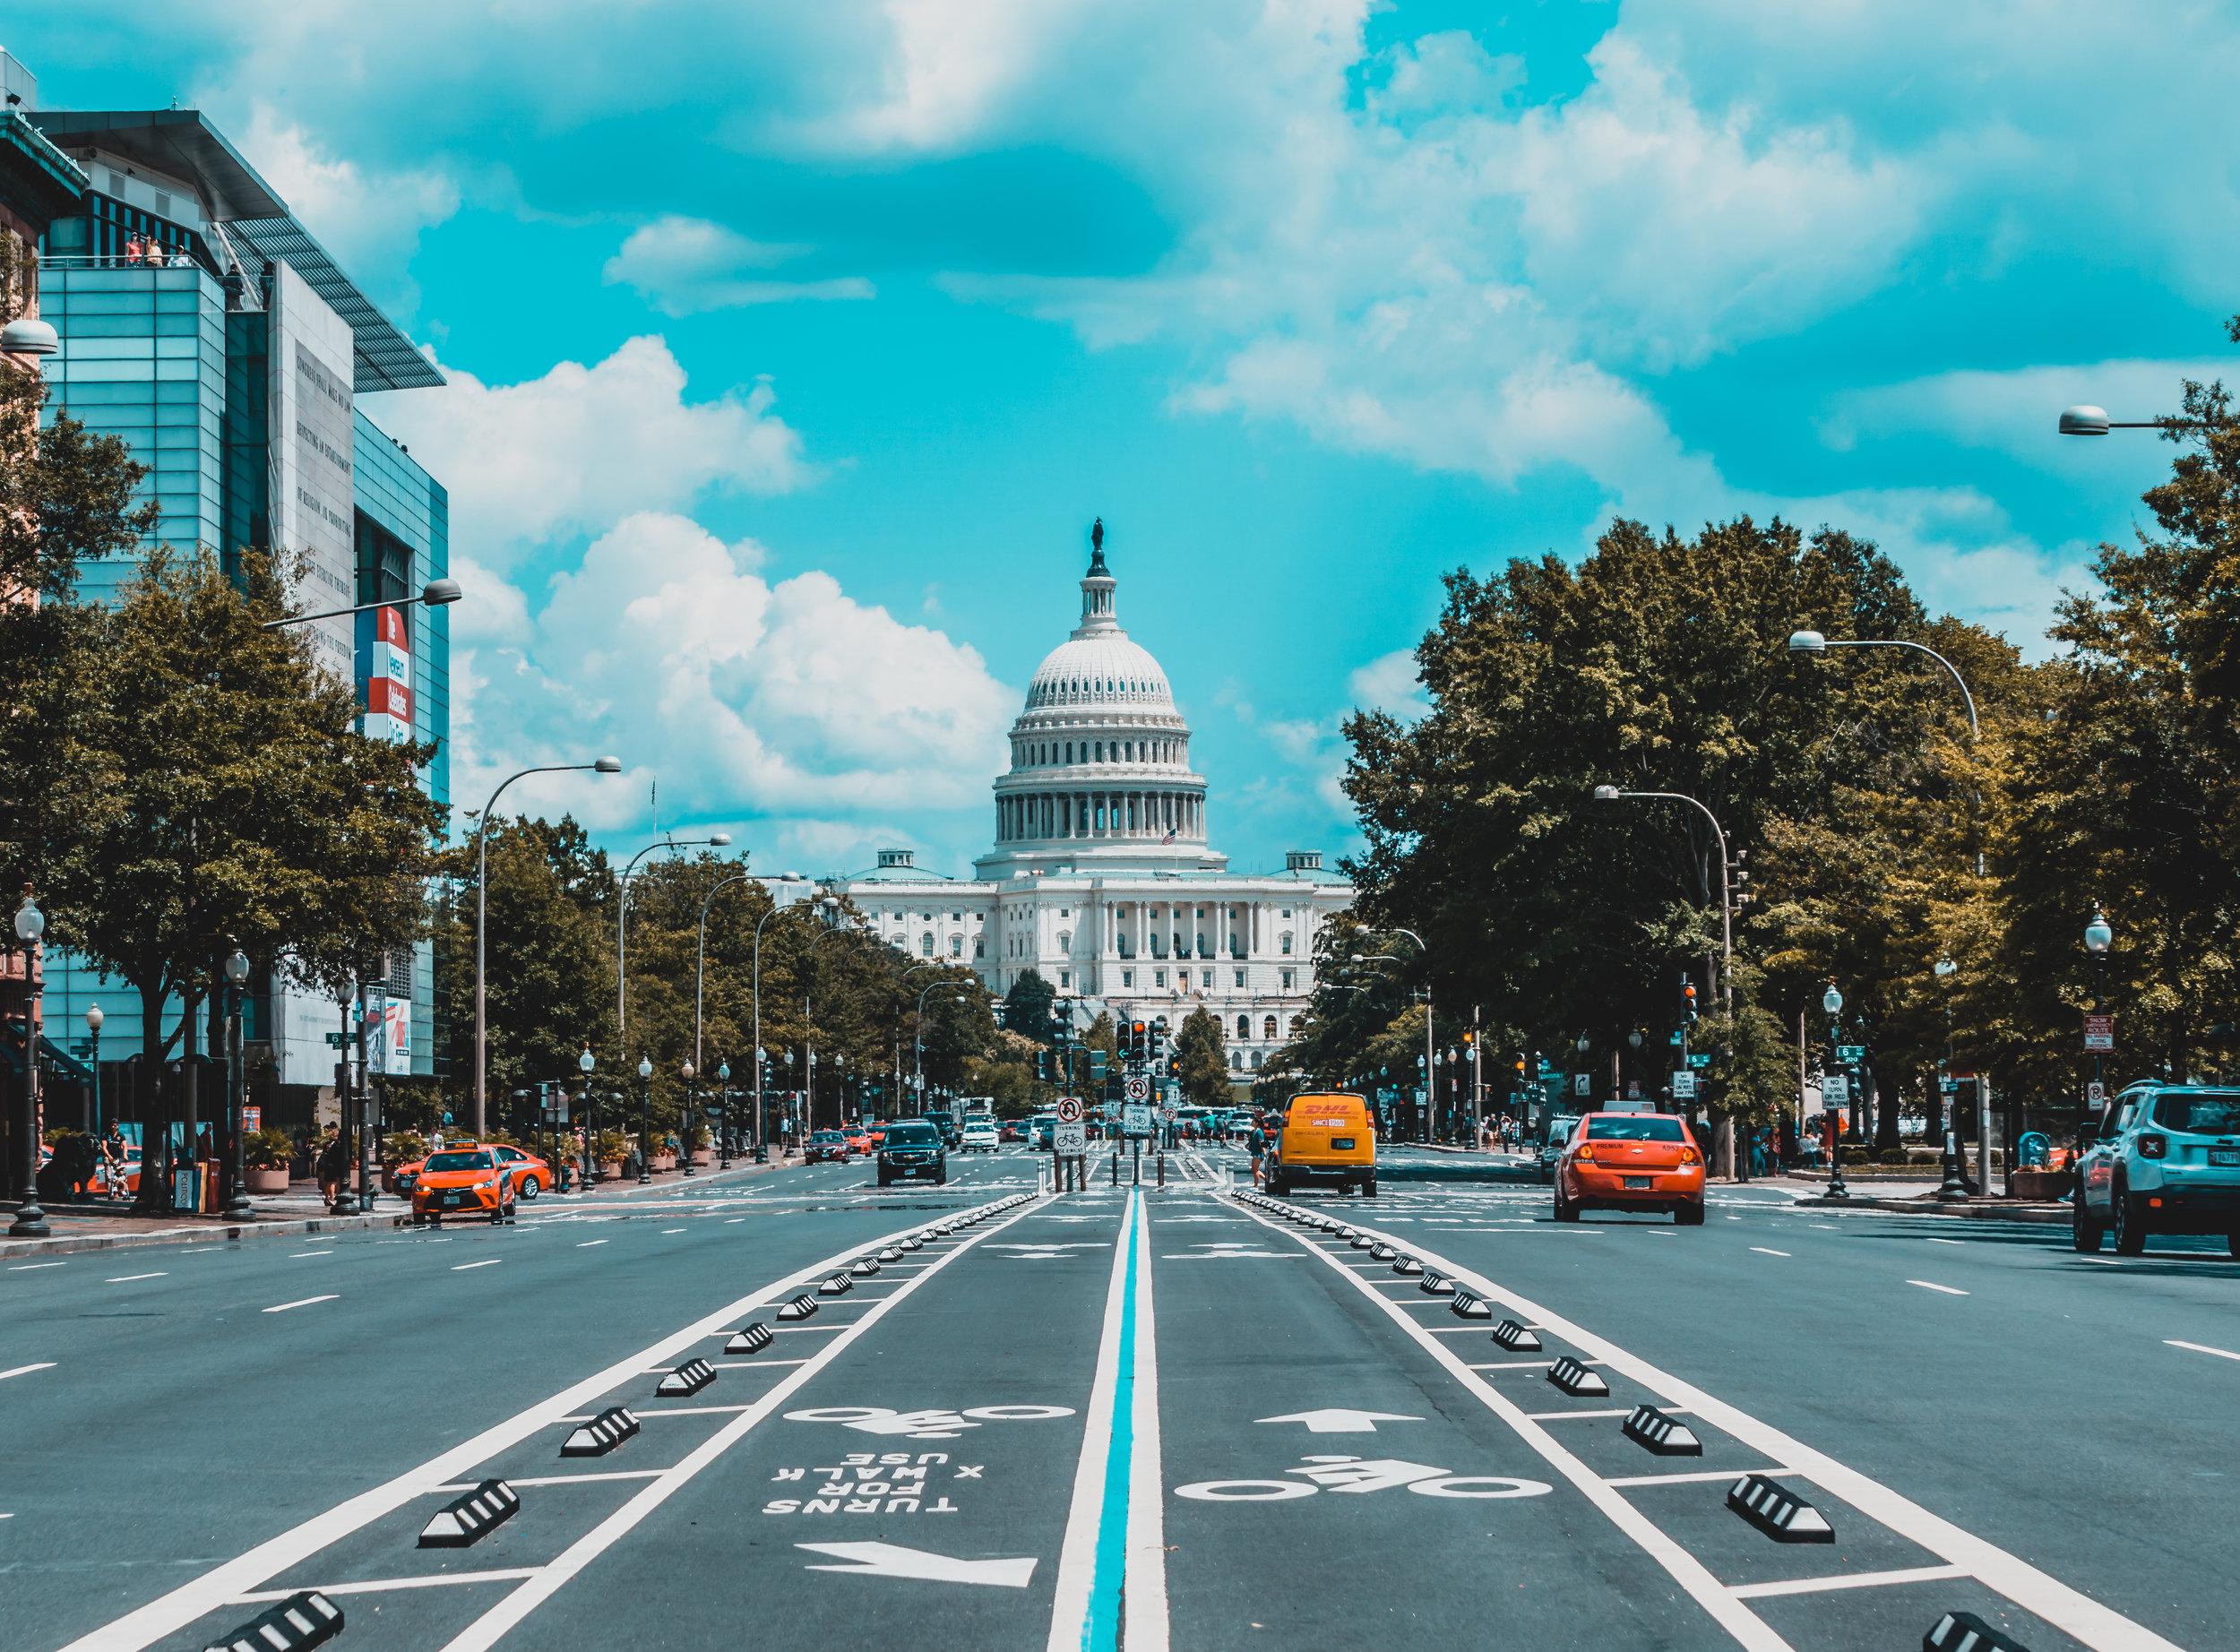 Washington, D.C. Region 2015 -